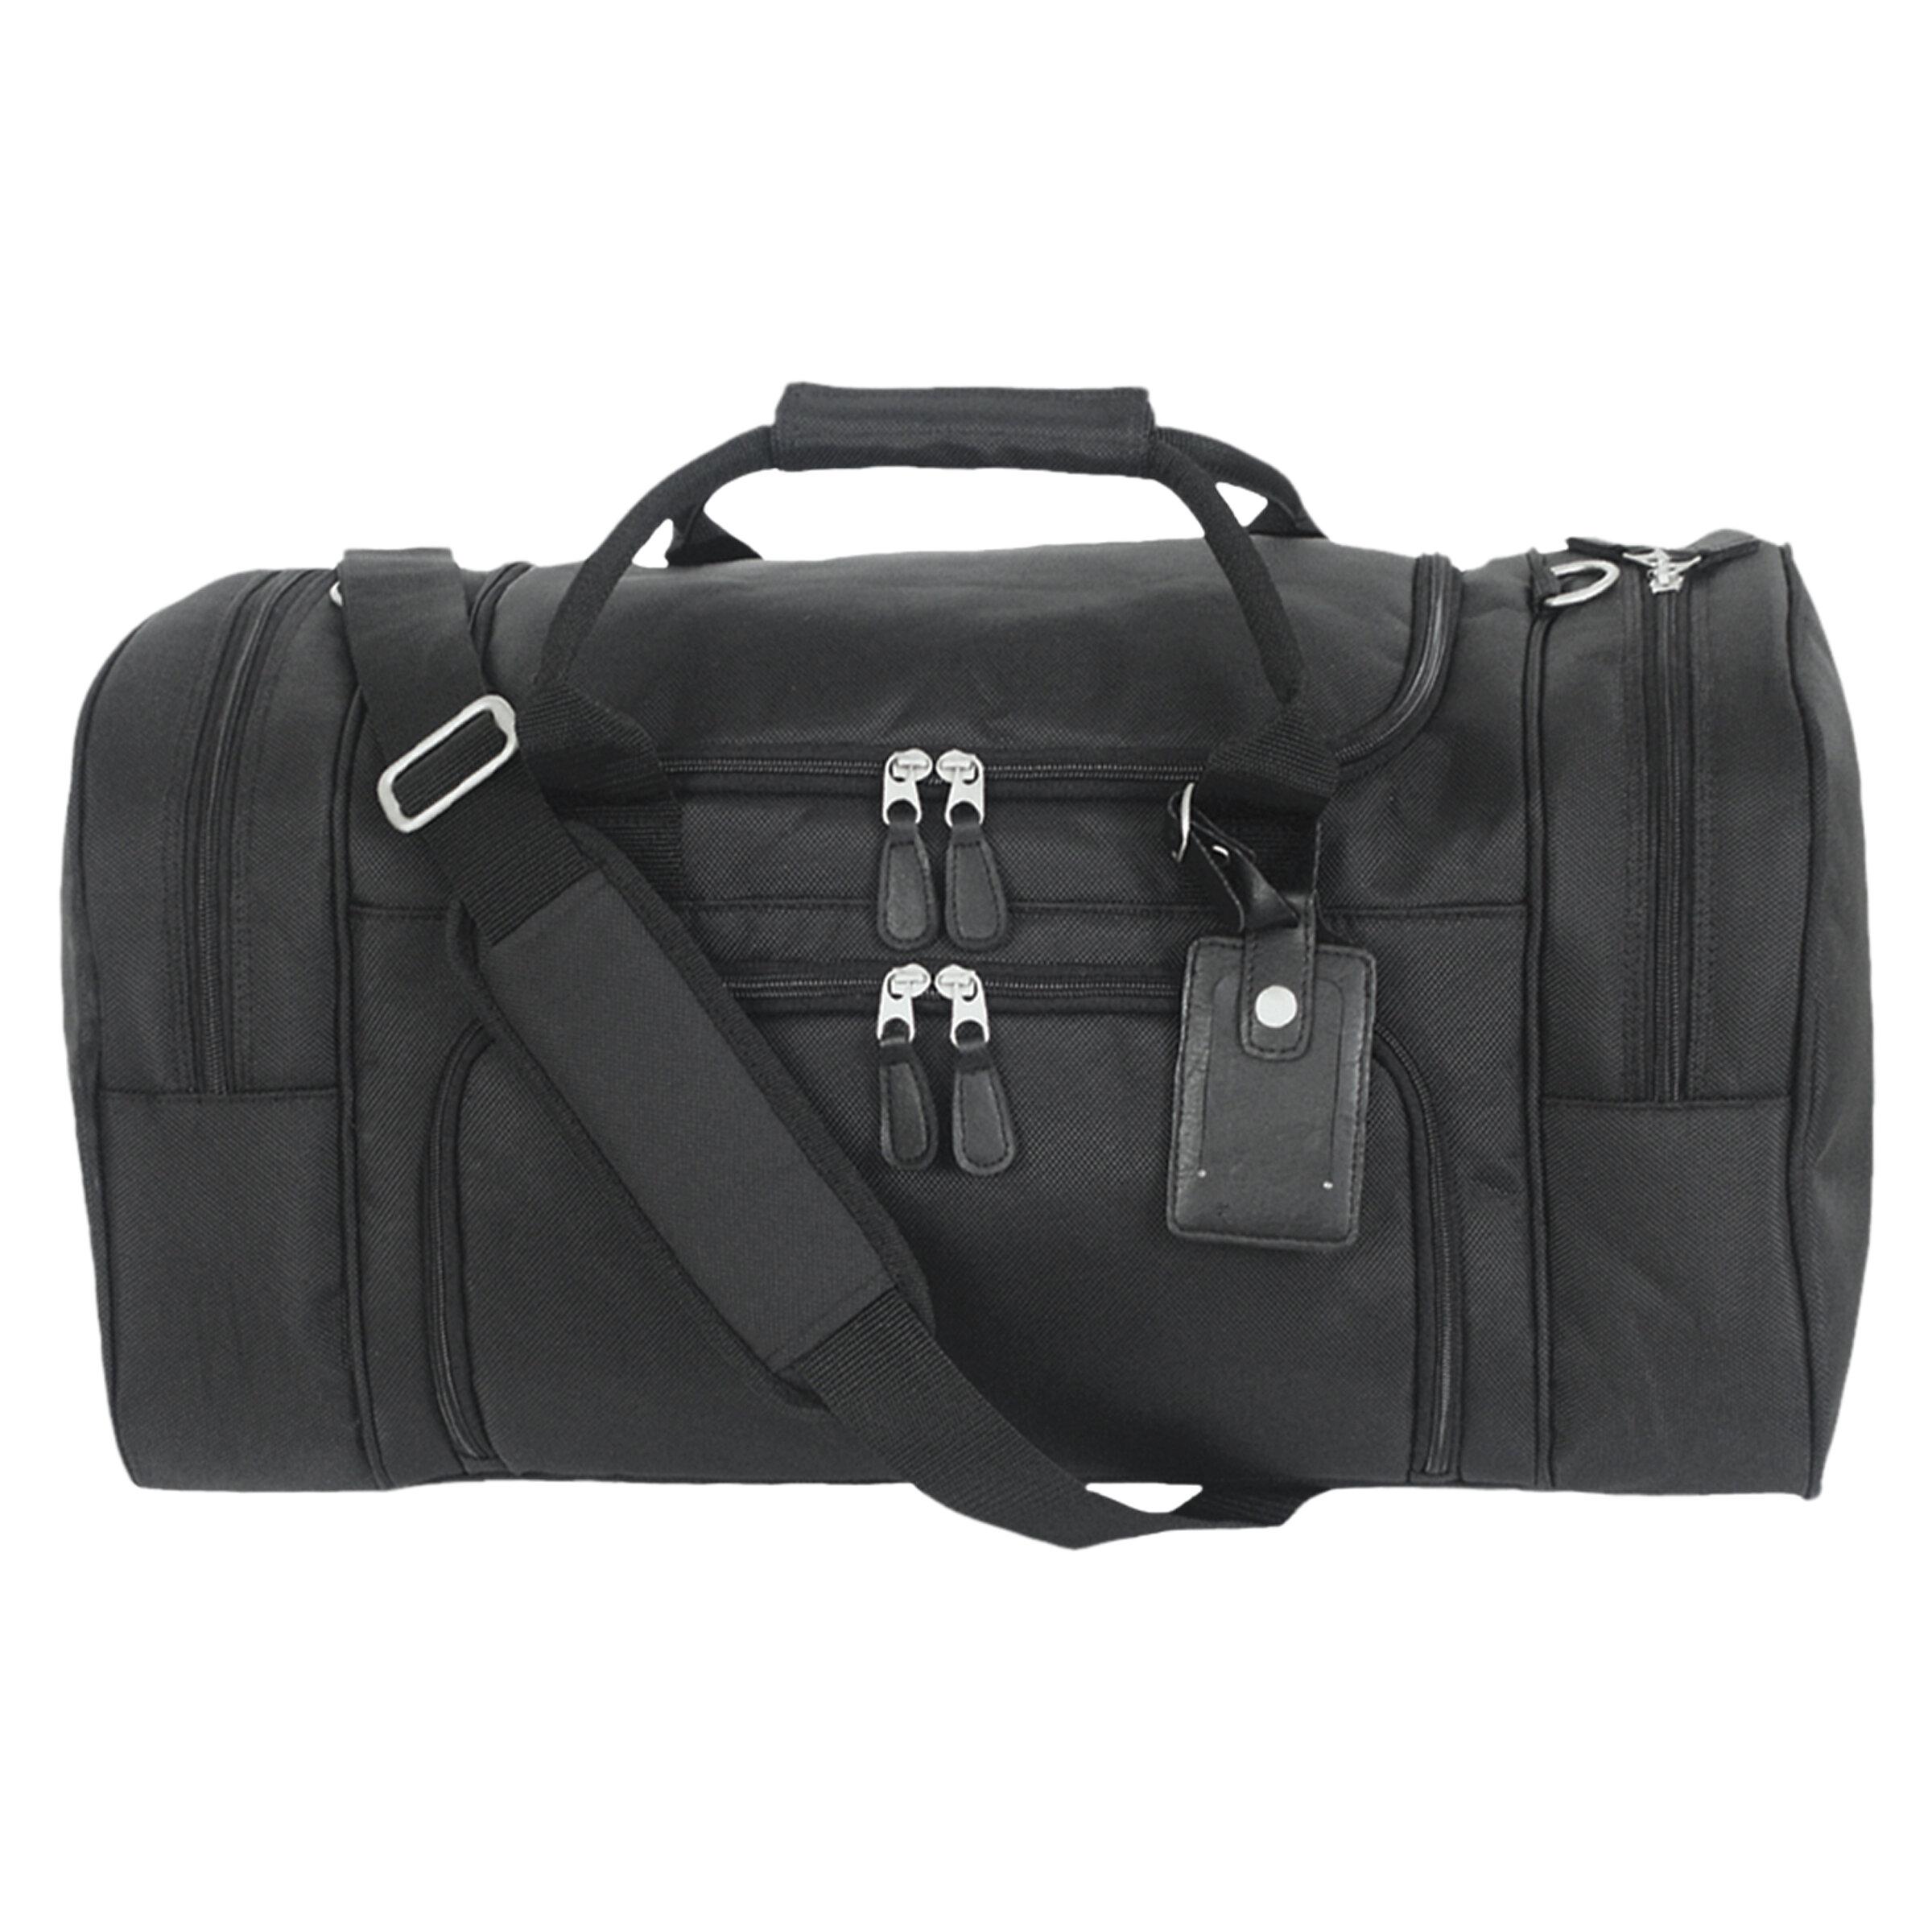 Mercury Luggage Signature Series 21